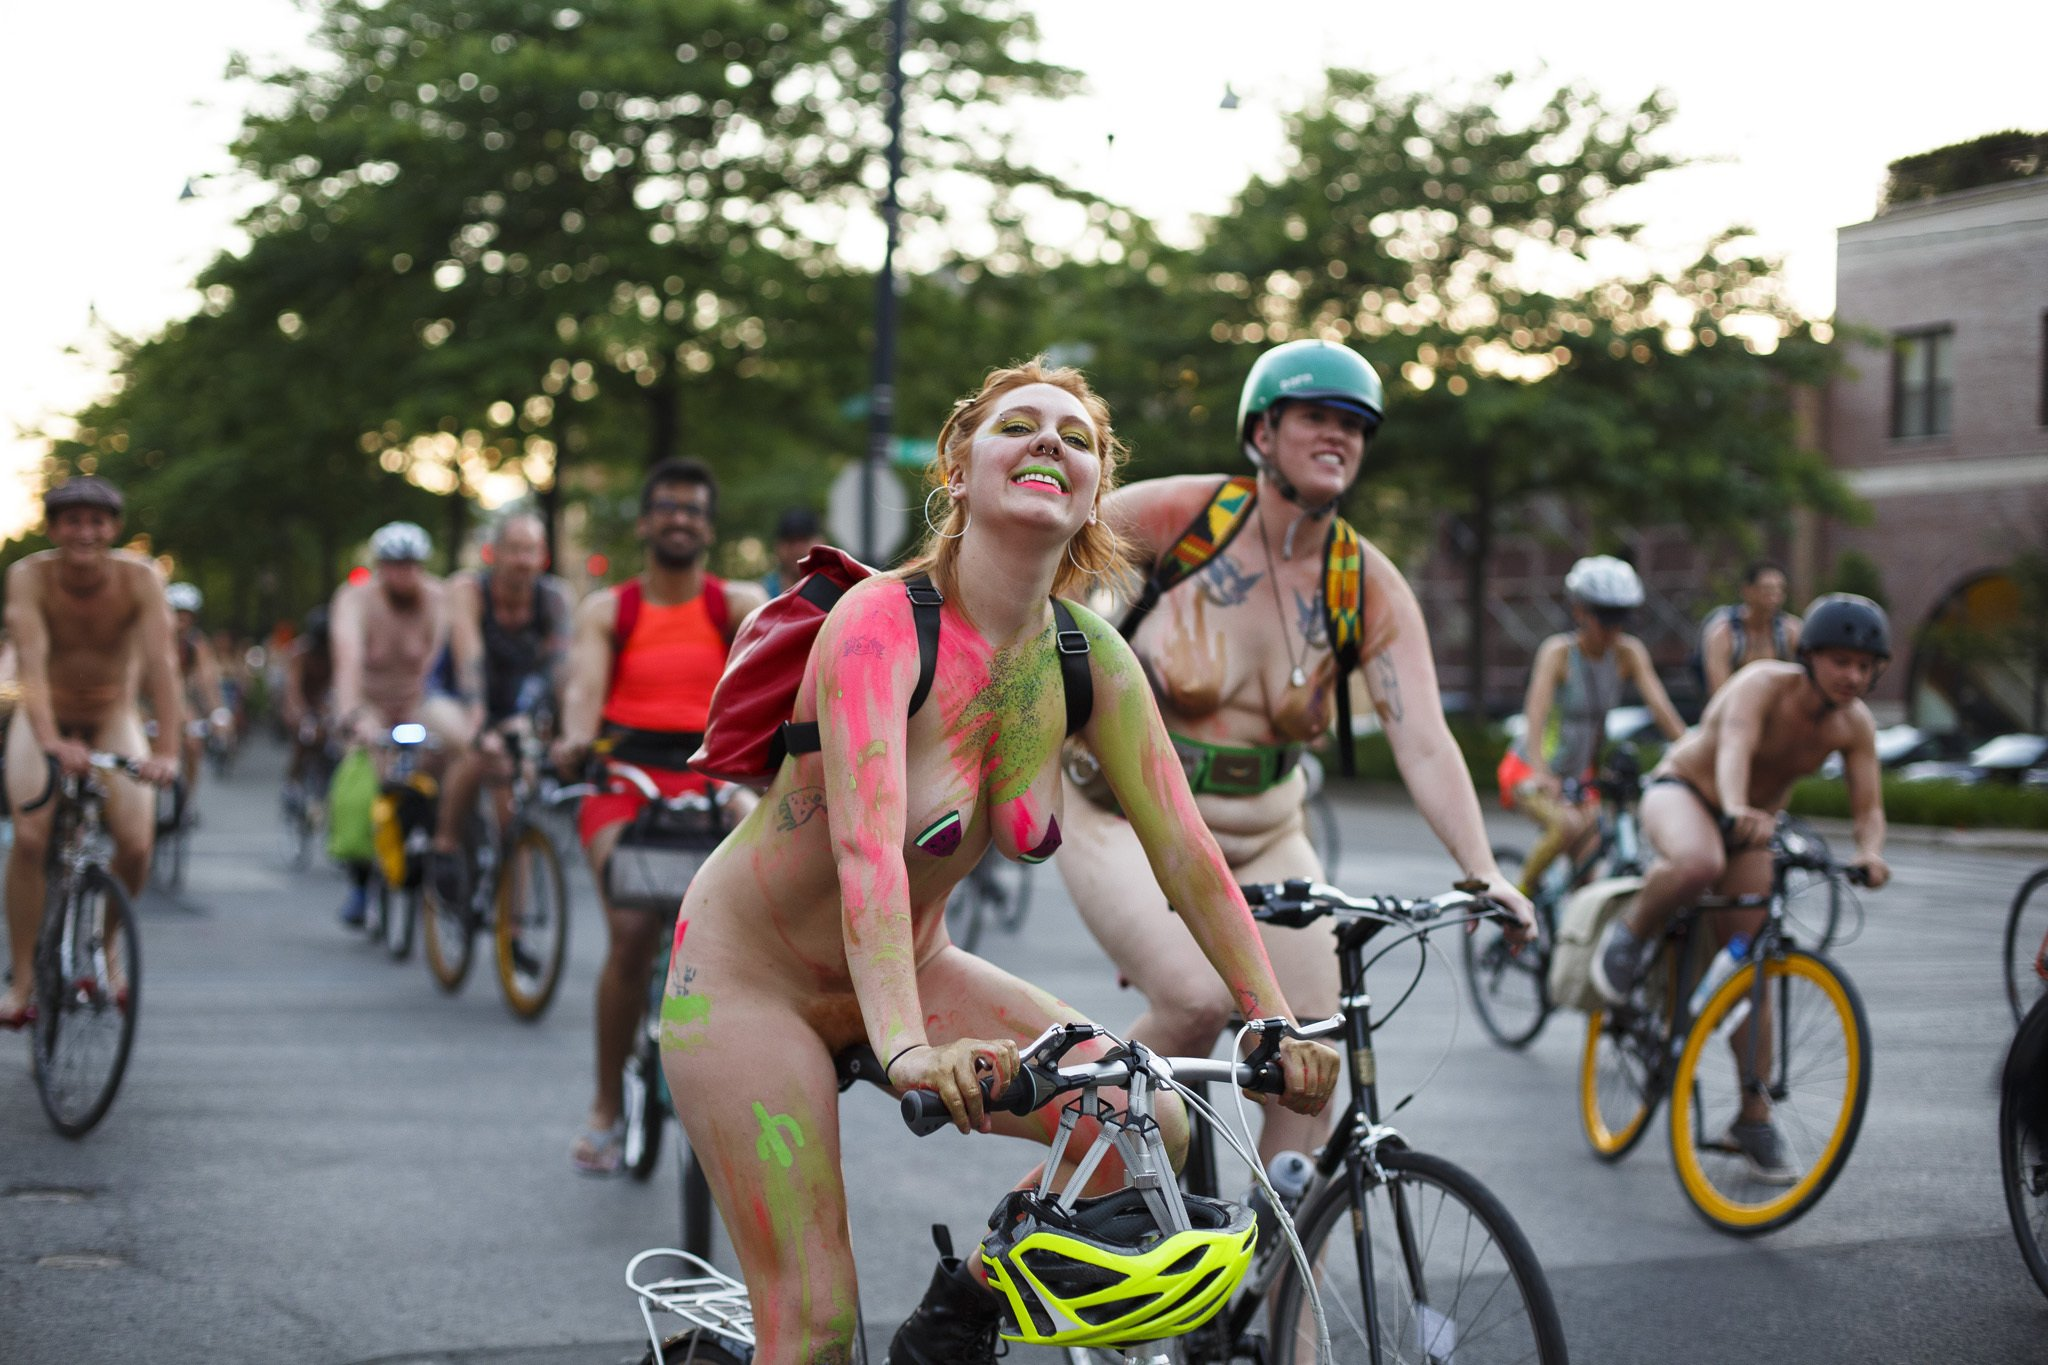 Naked cycling